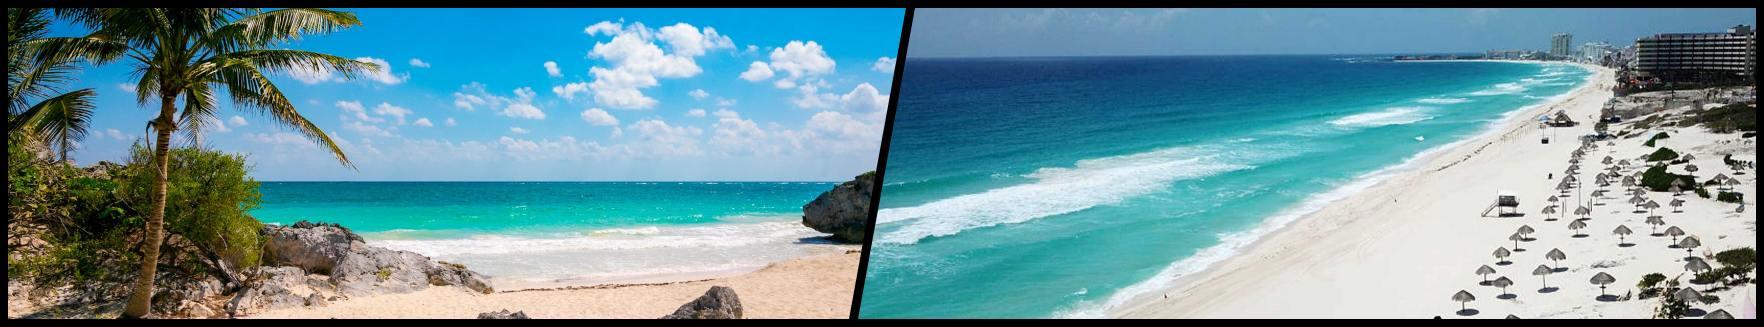 Playa del Carmen - Cancun